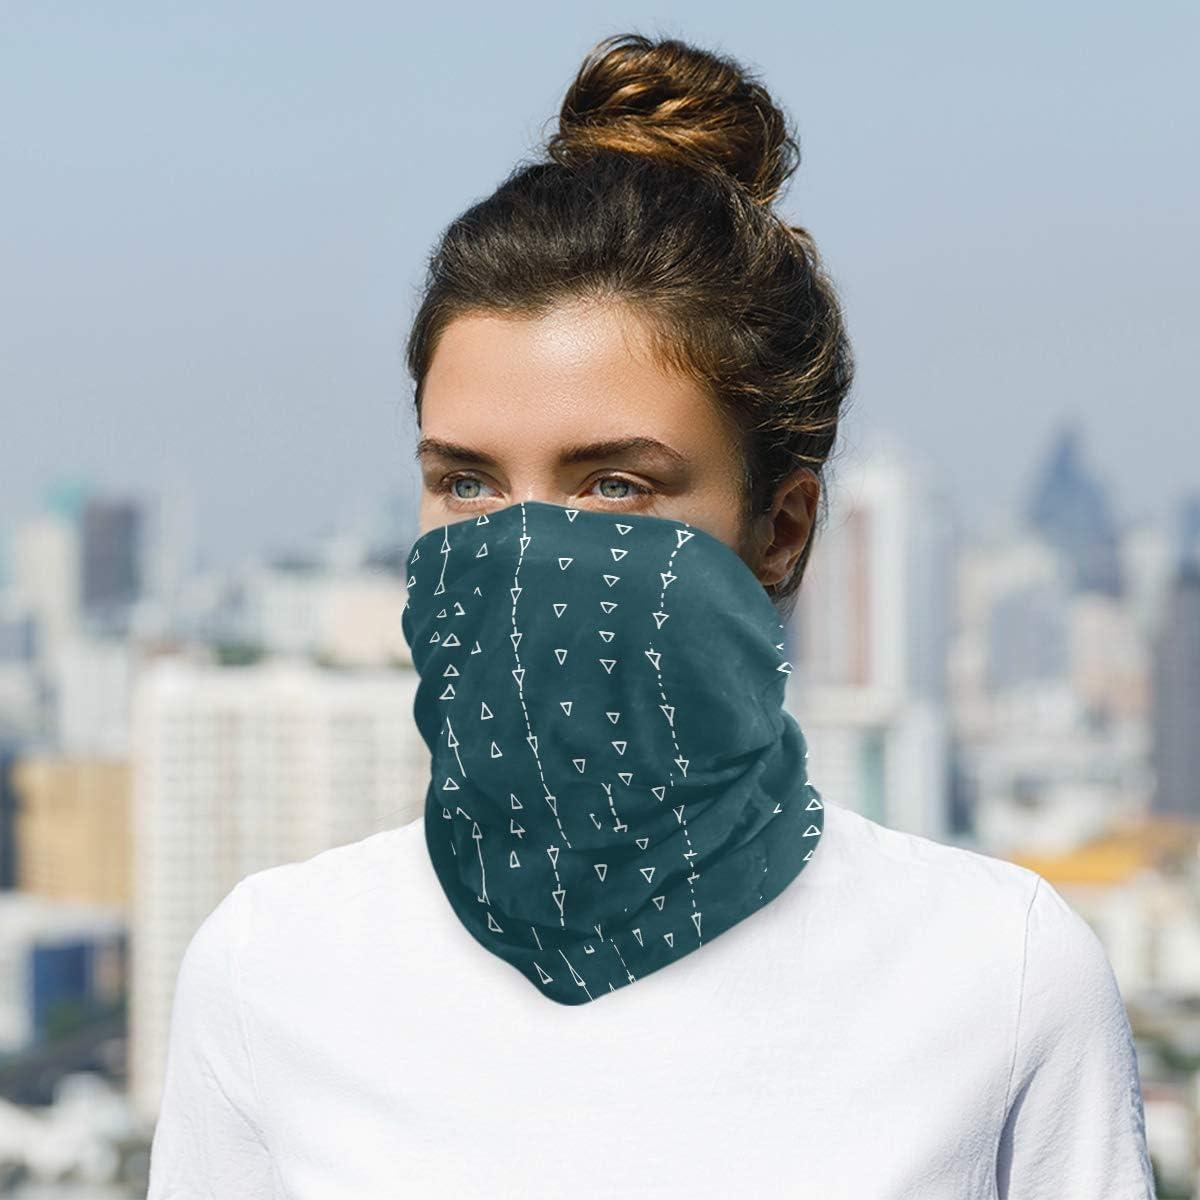 Pattern MinimalistFace Mask Sun UV Protection Bandana Mask Rave Neck Gaiter Balaclava Headwrap Face Cover Scarf